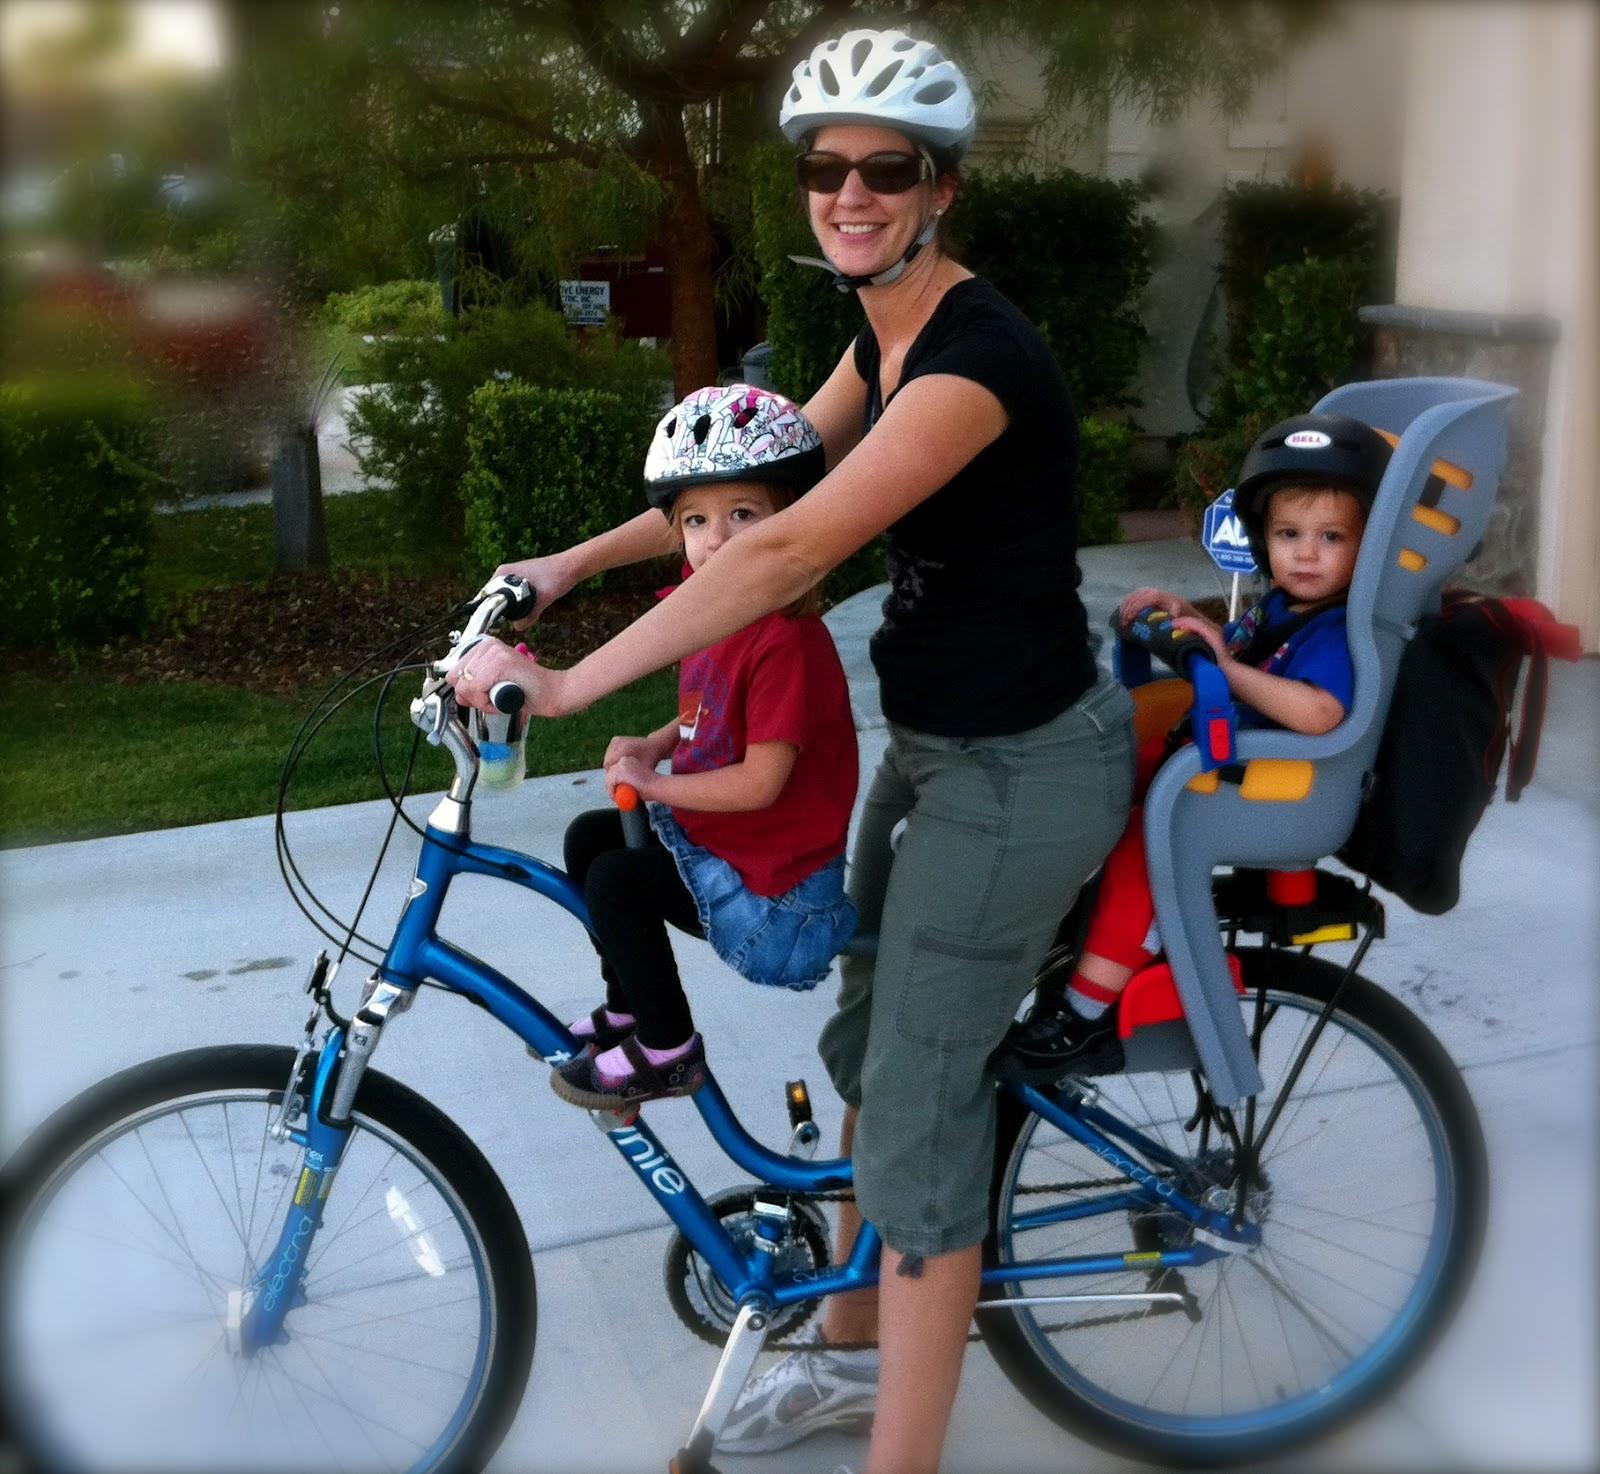 Bike Riding With Three Small Children